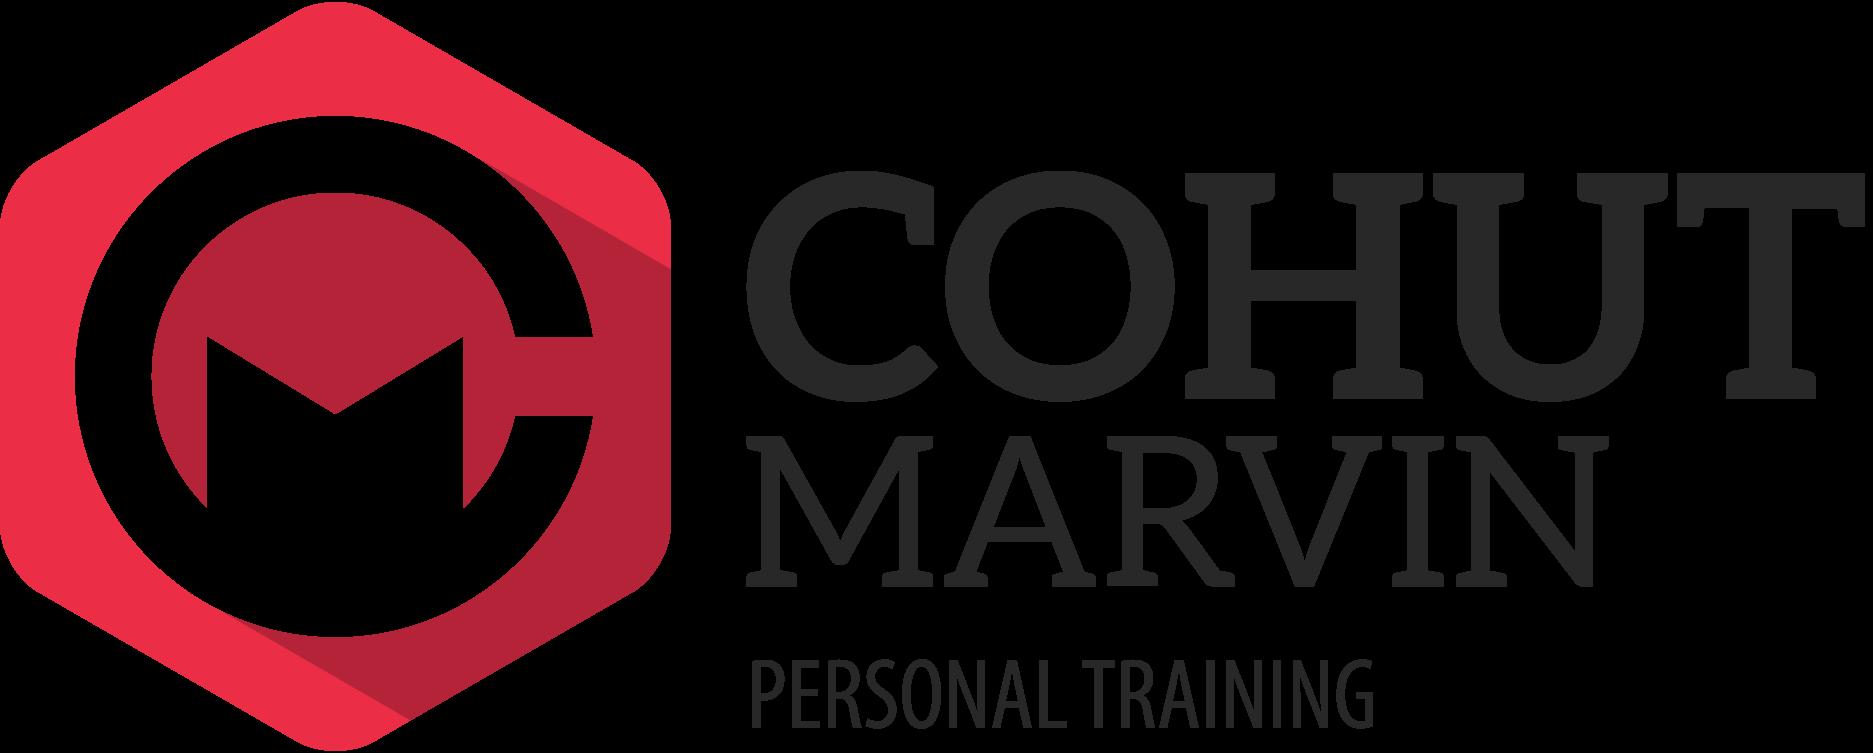 Marvin Cohut